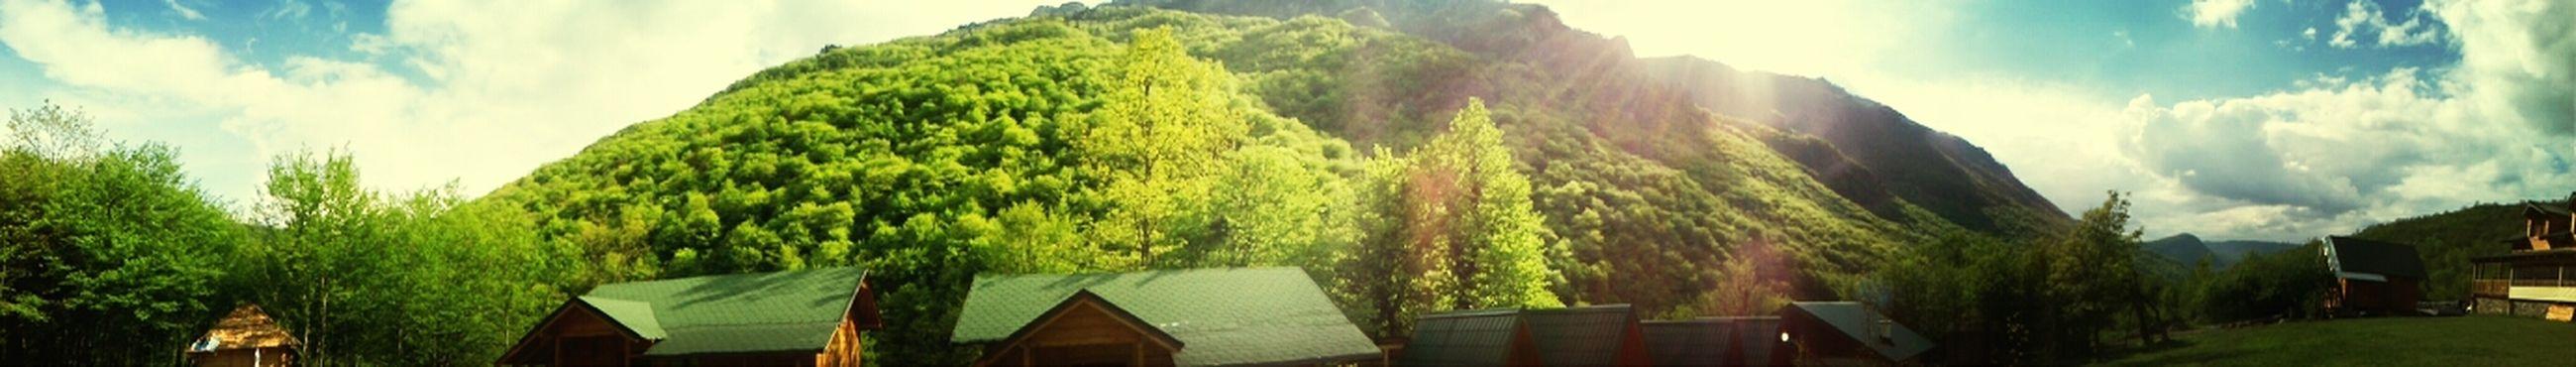 Beutiful  EyeEm Nature Lover Green